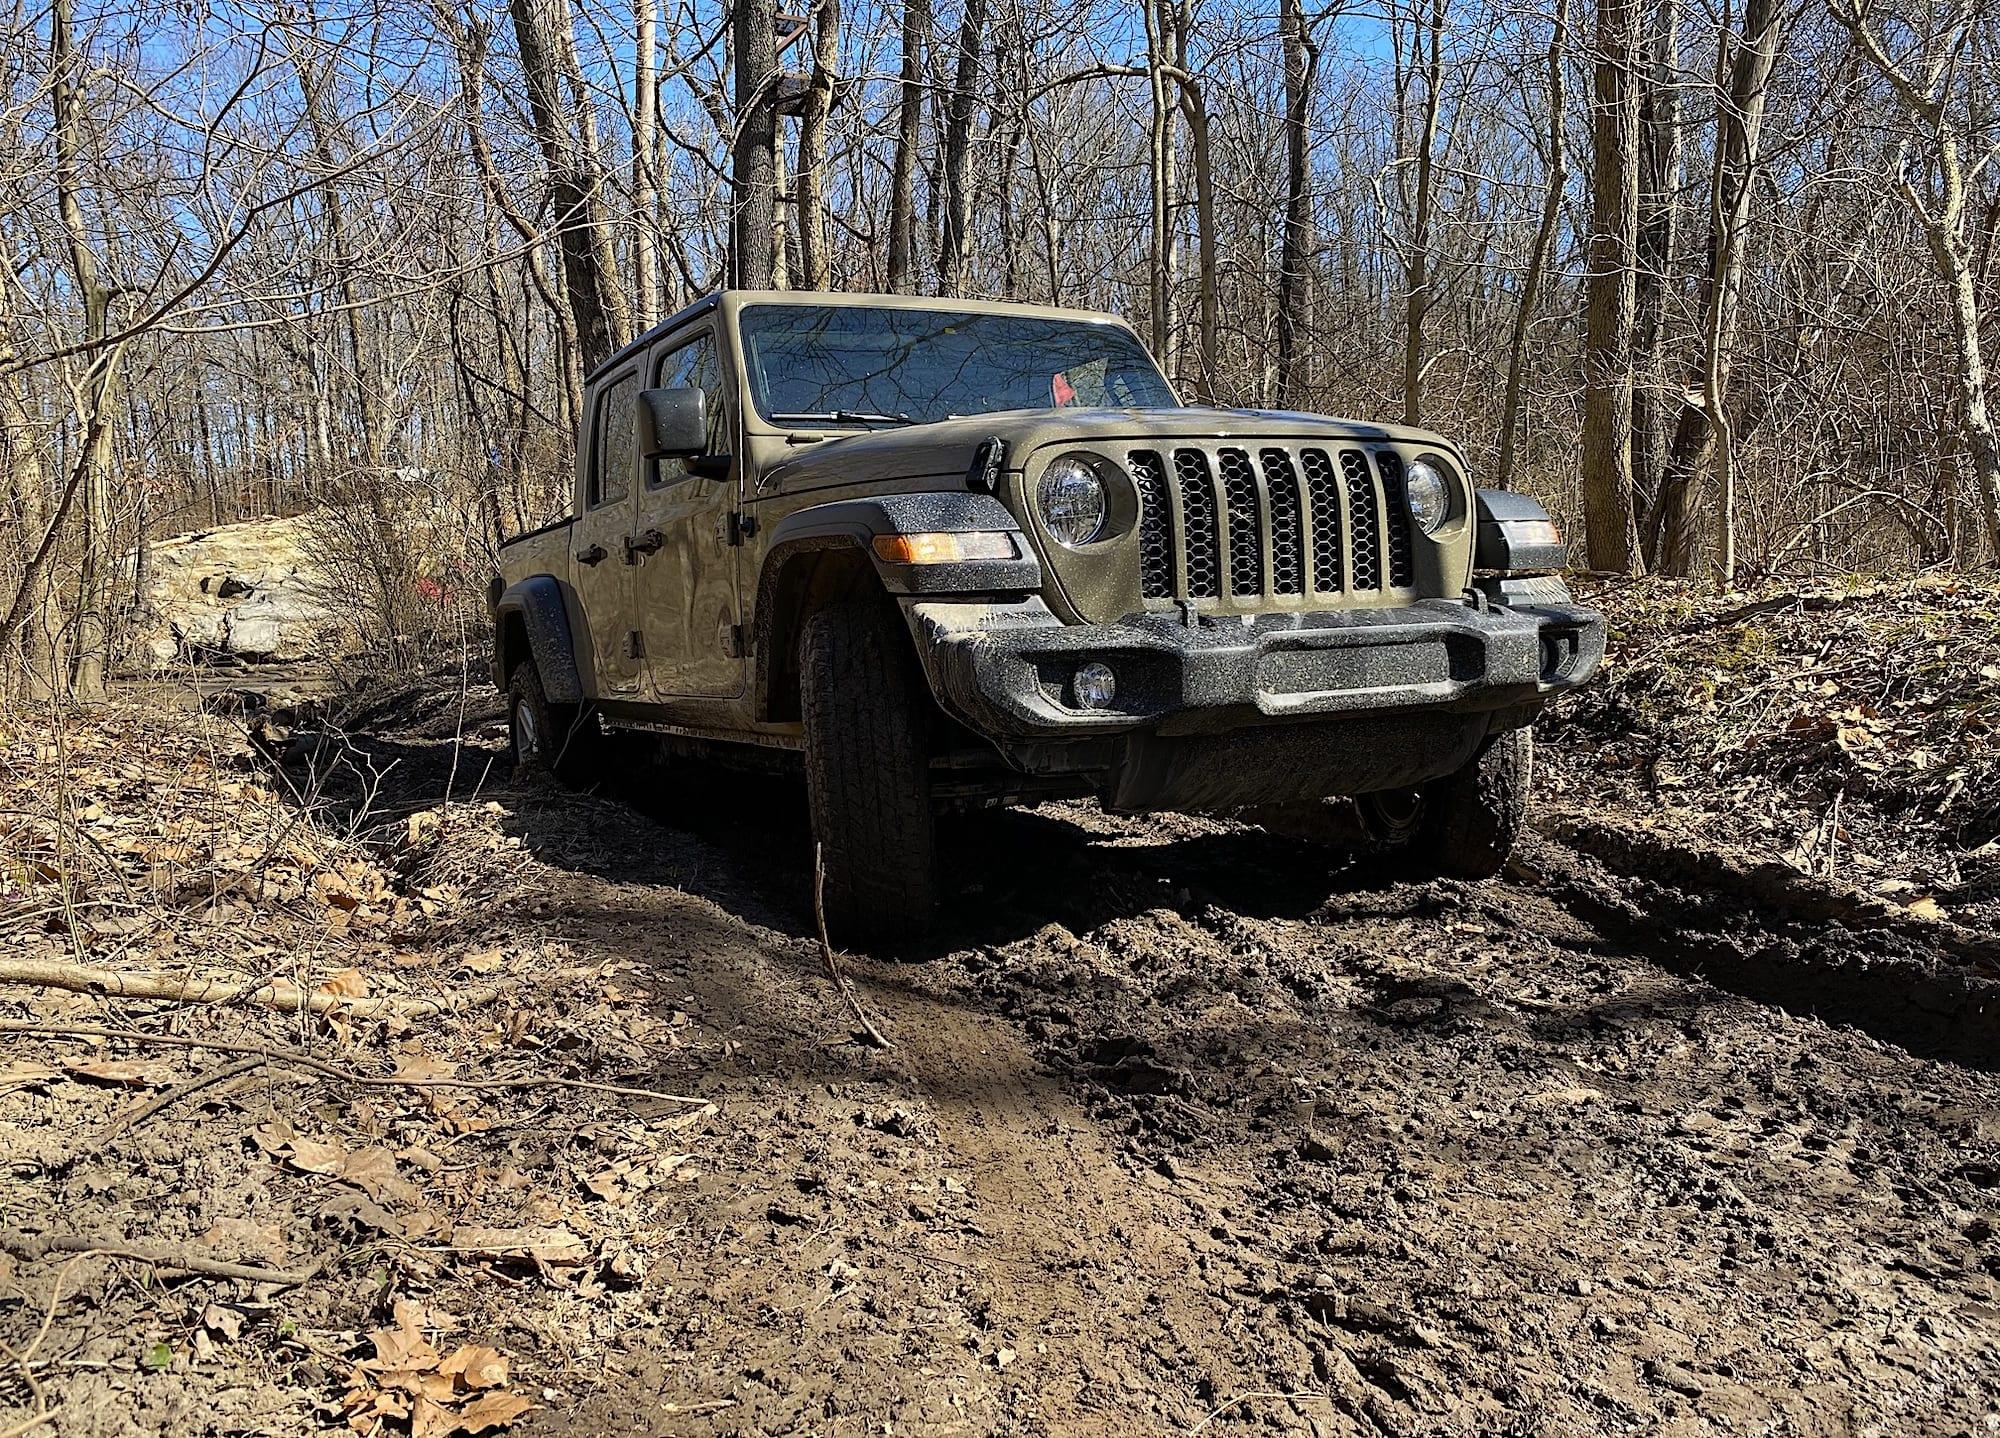 2020 Jeep Gladiator off roading